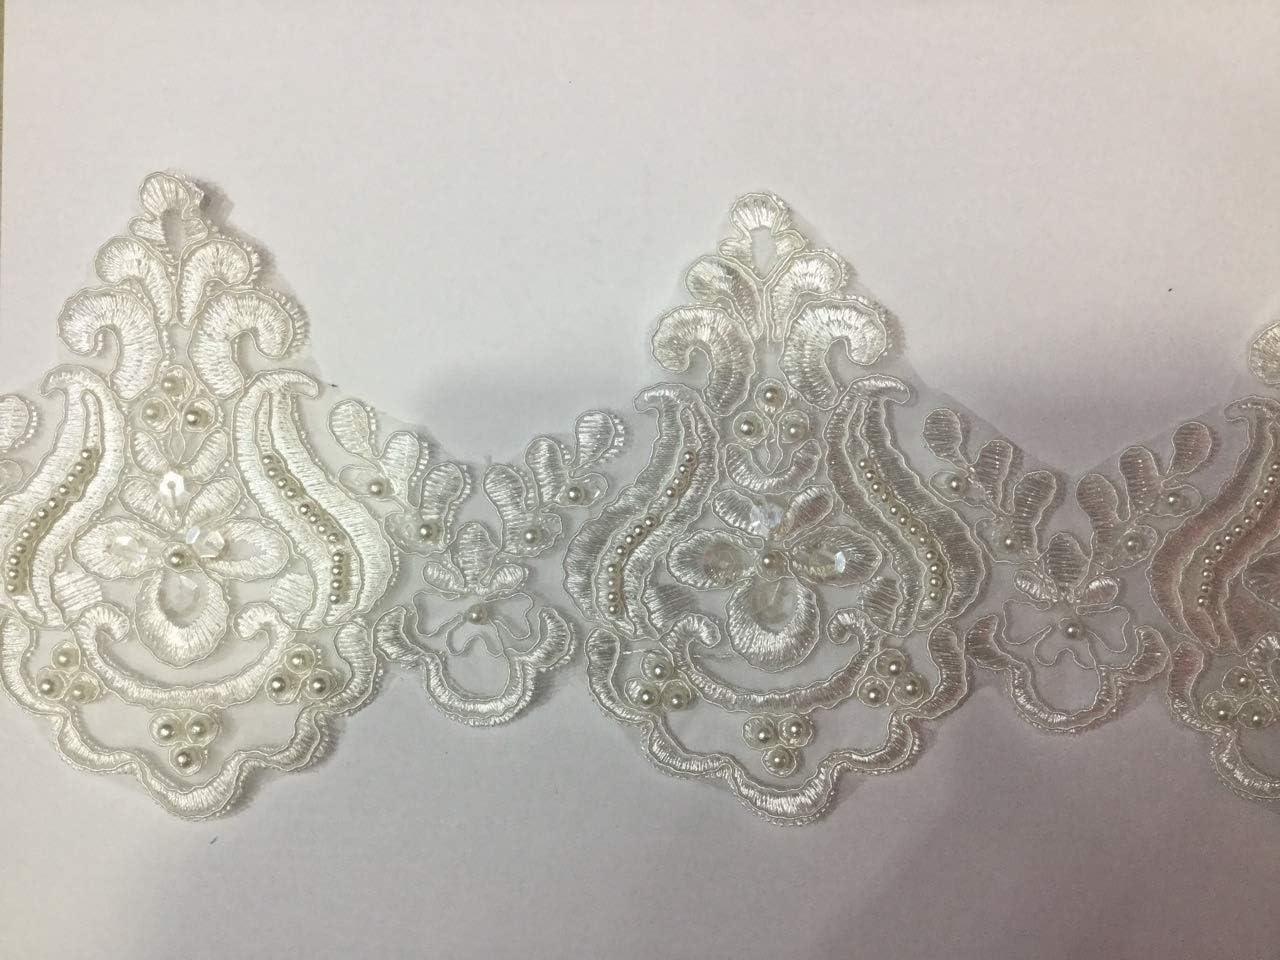 Beaded Lace Popularity Trim Sequinned Vintage 2021 model DIY Wedding Bridal Decorative